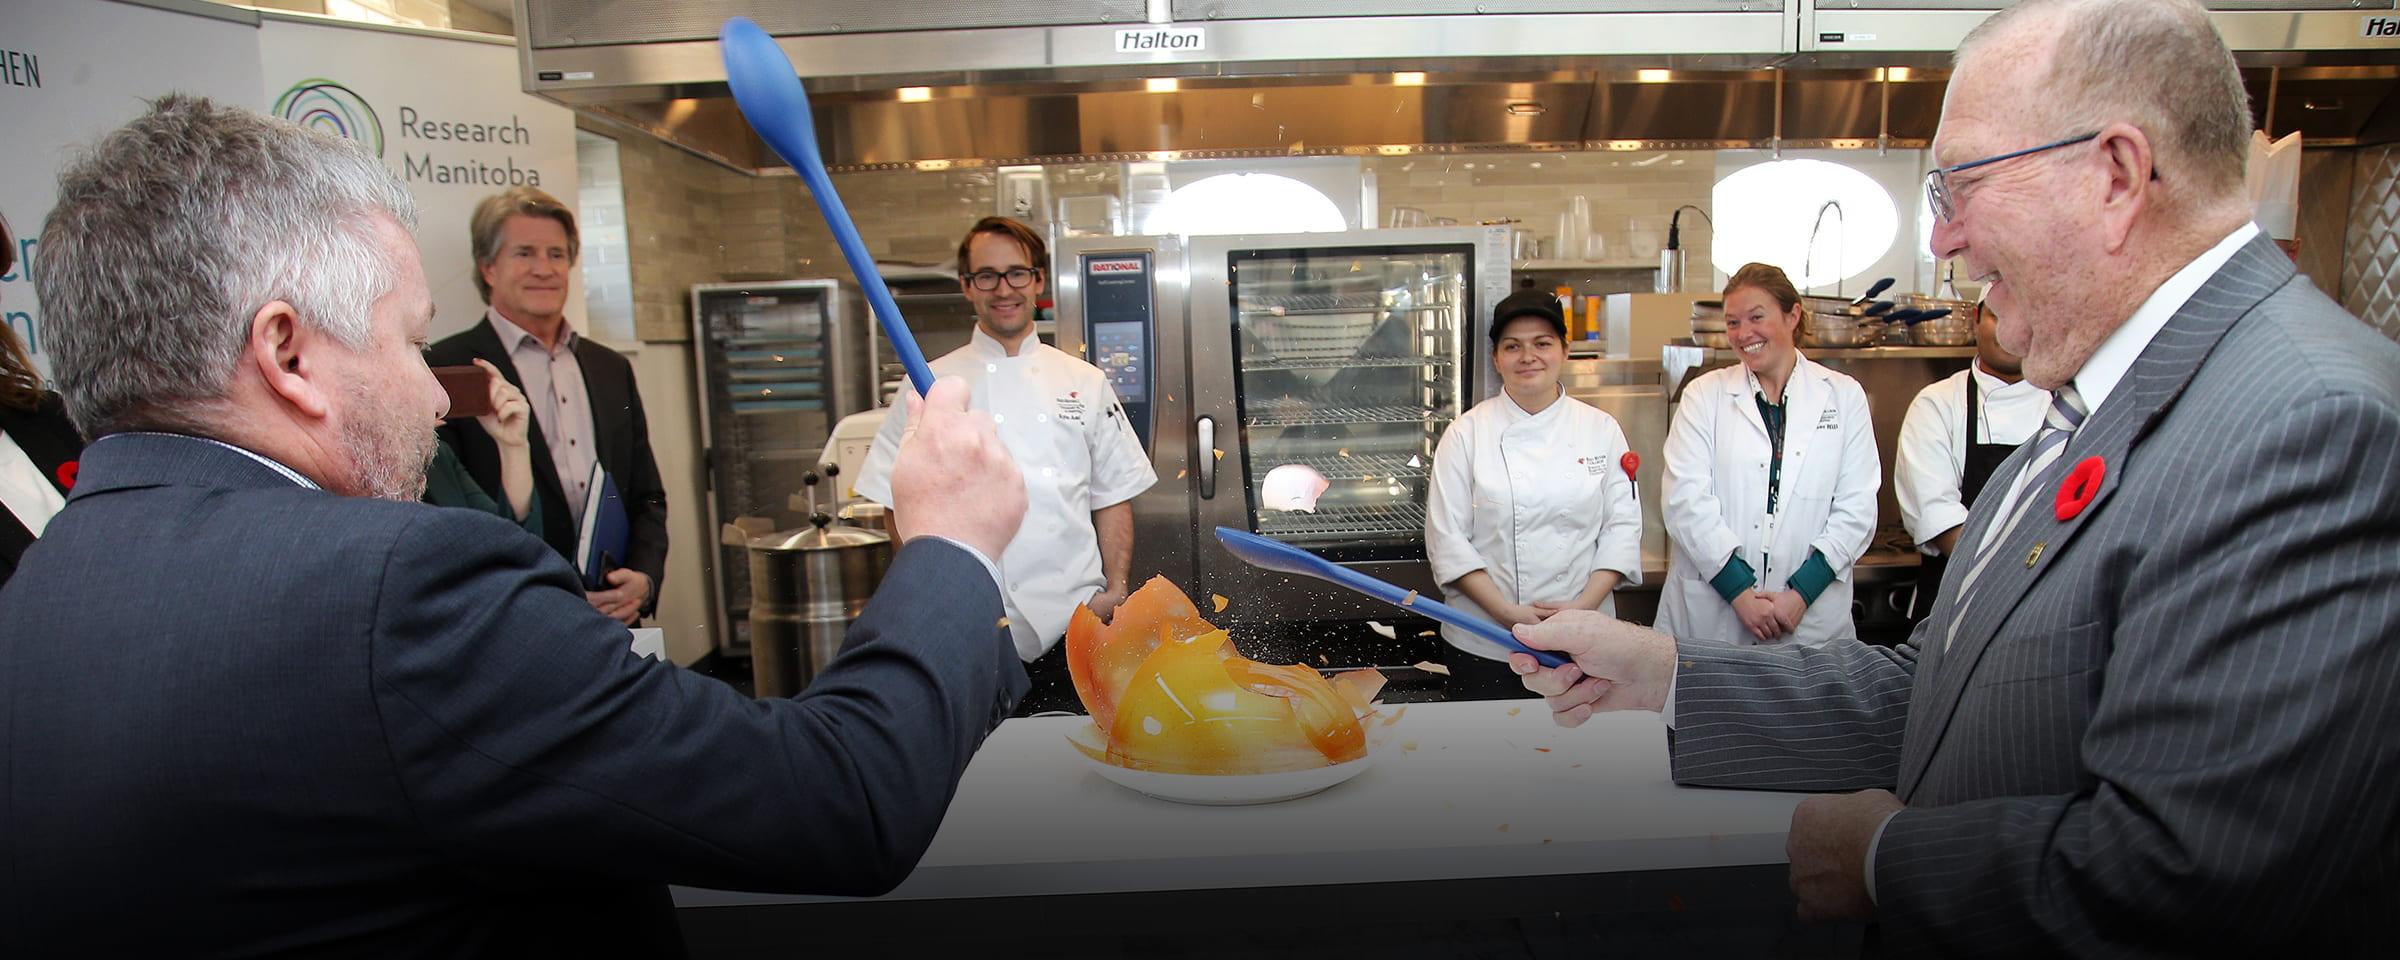 Opening, Prairie Research Kitchen